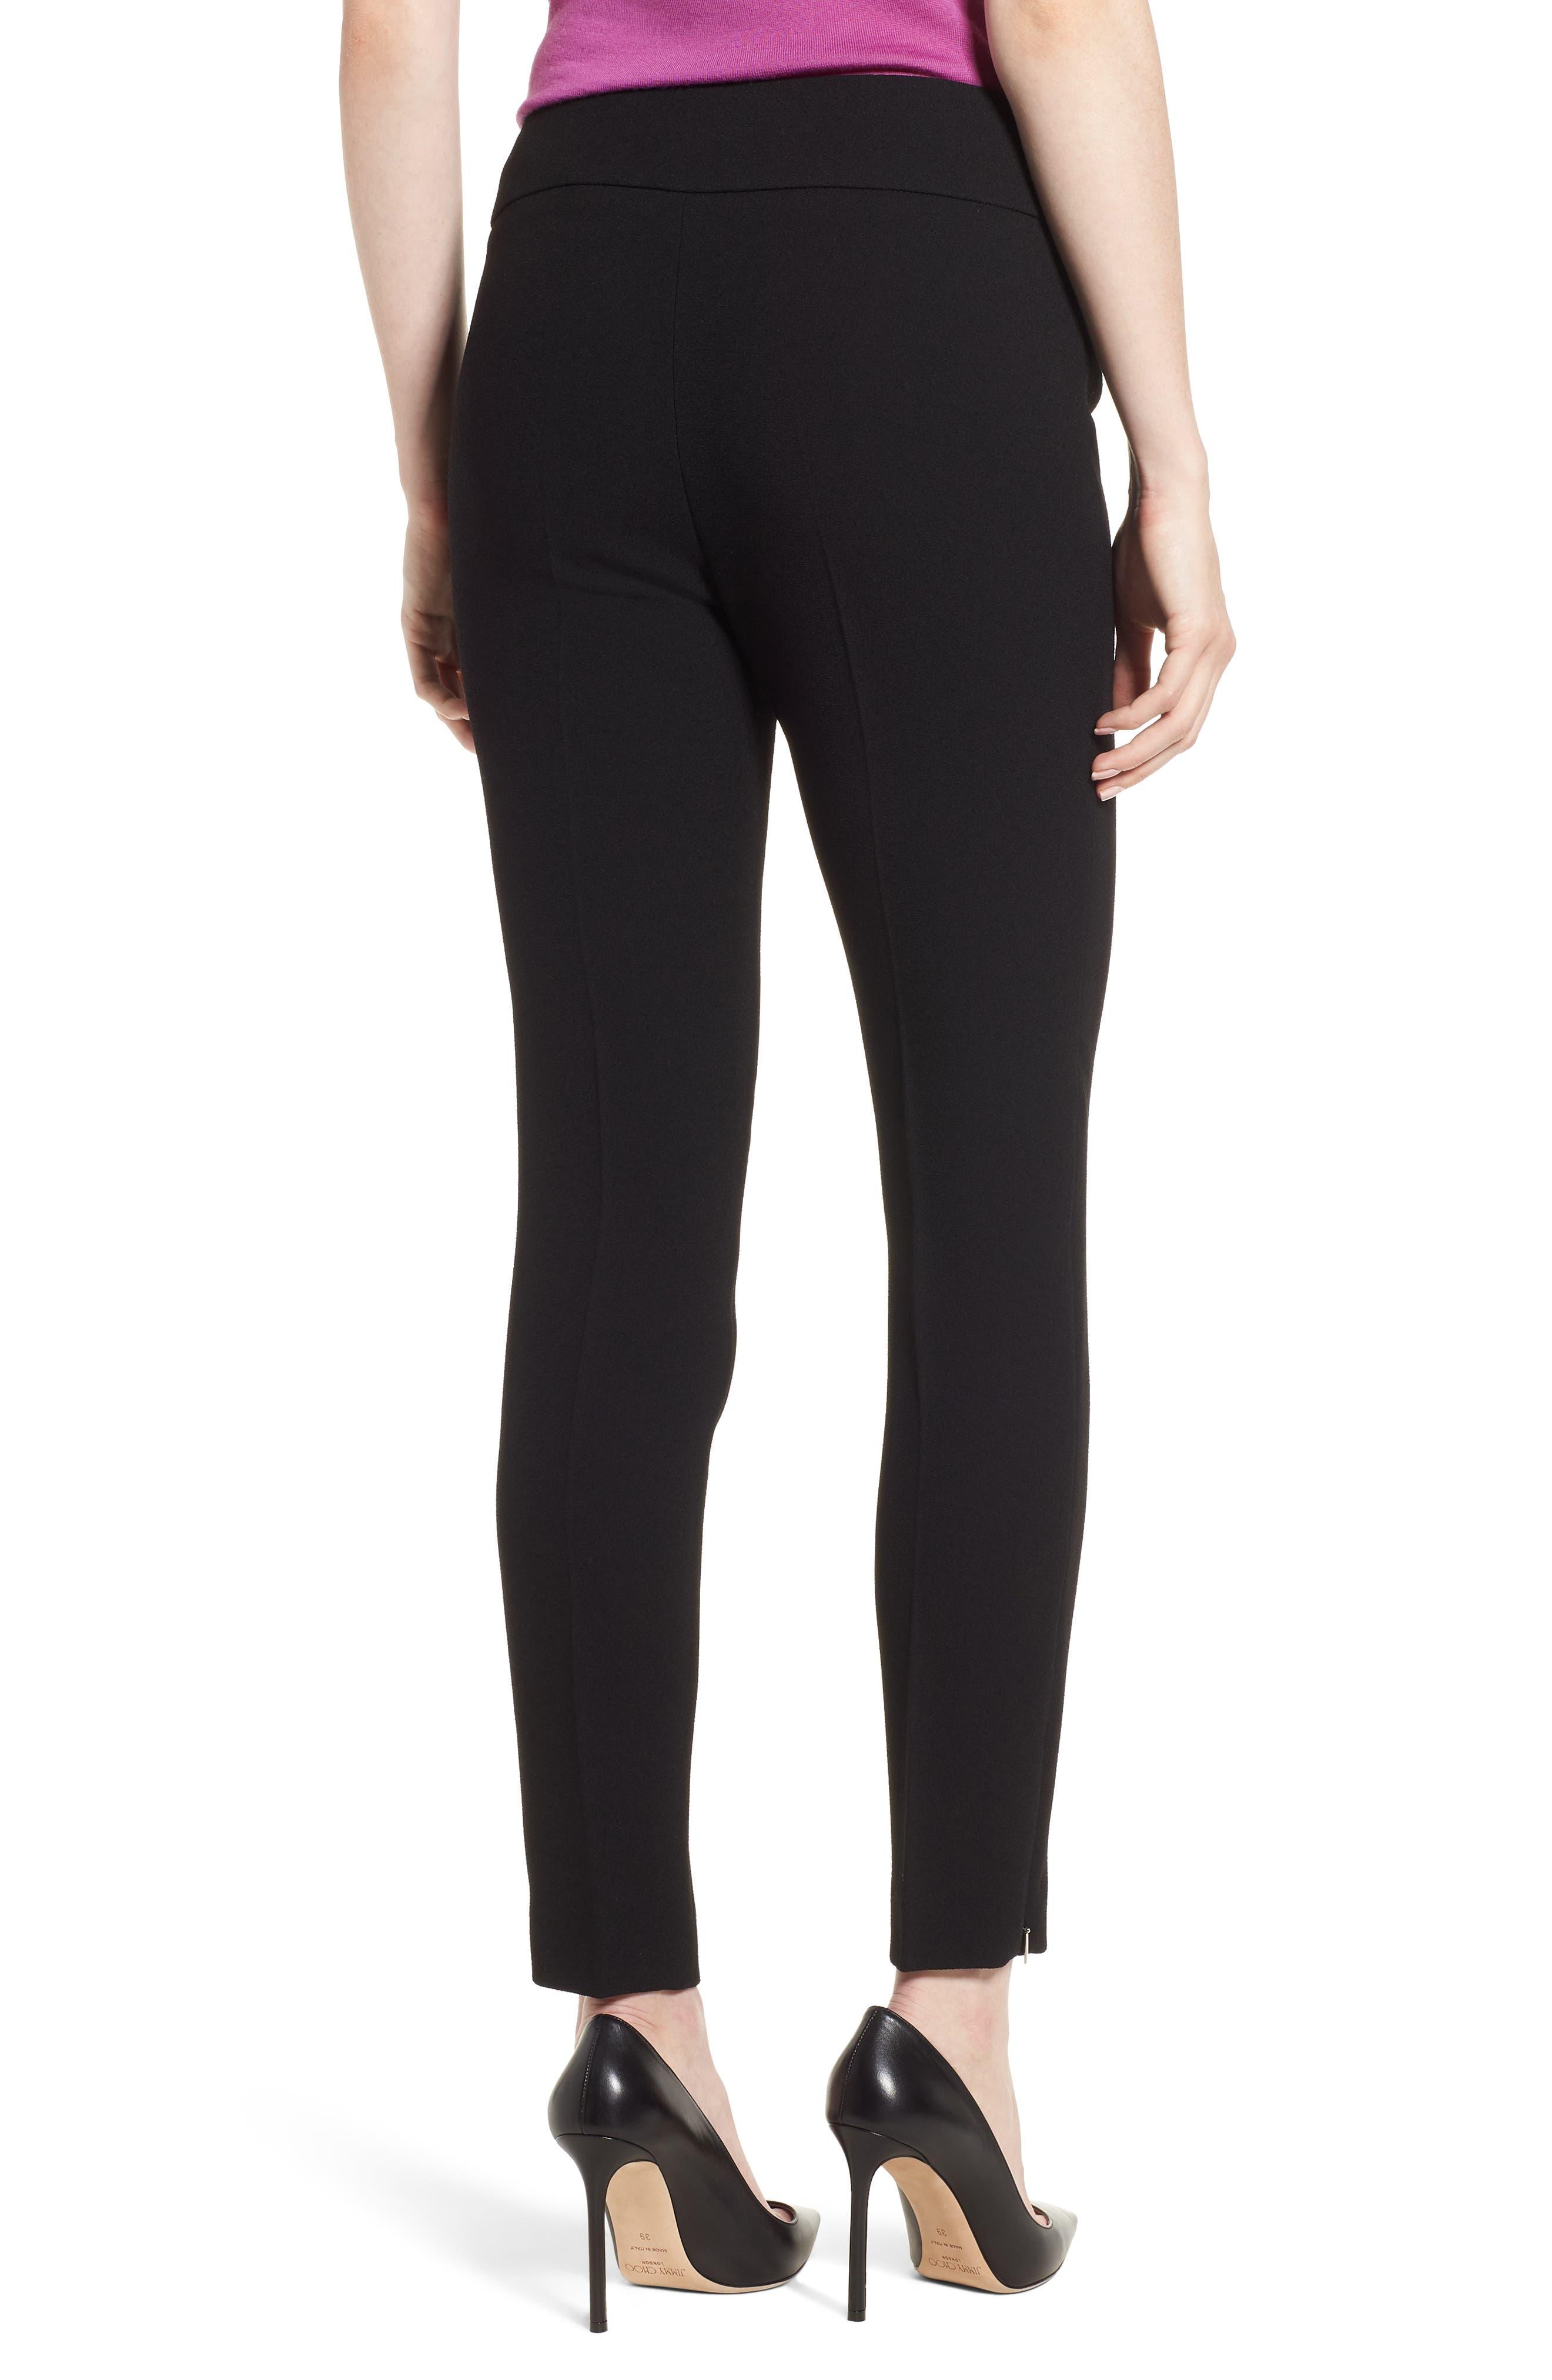 Timalea Compact Crepe Side Zip Slim Leg Trousers,                             Alternate thumbnail 2, color,                             Black